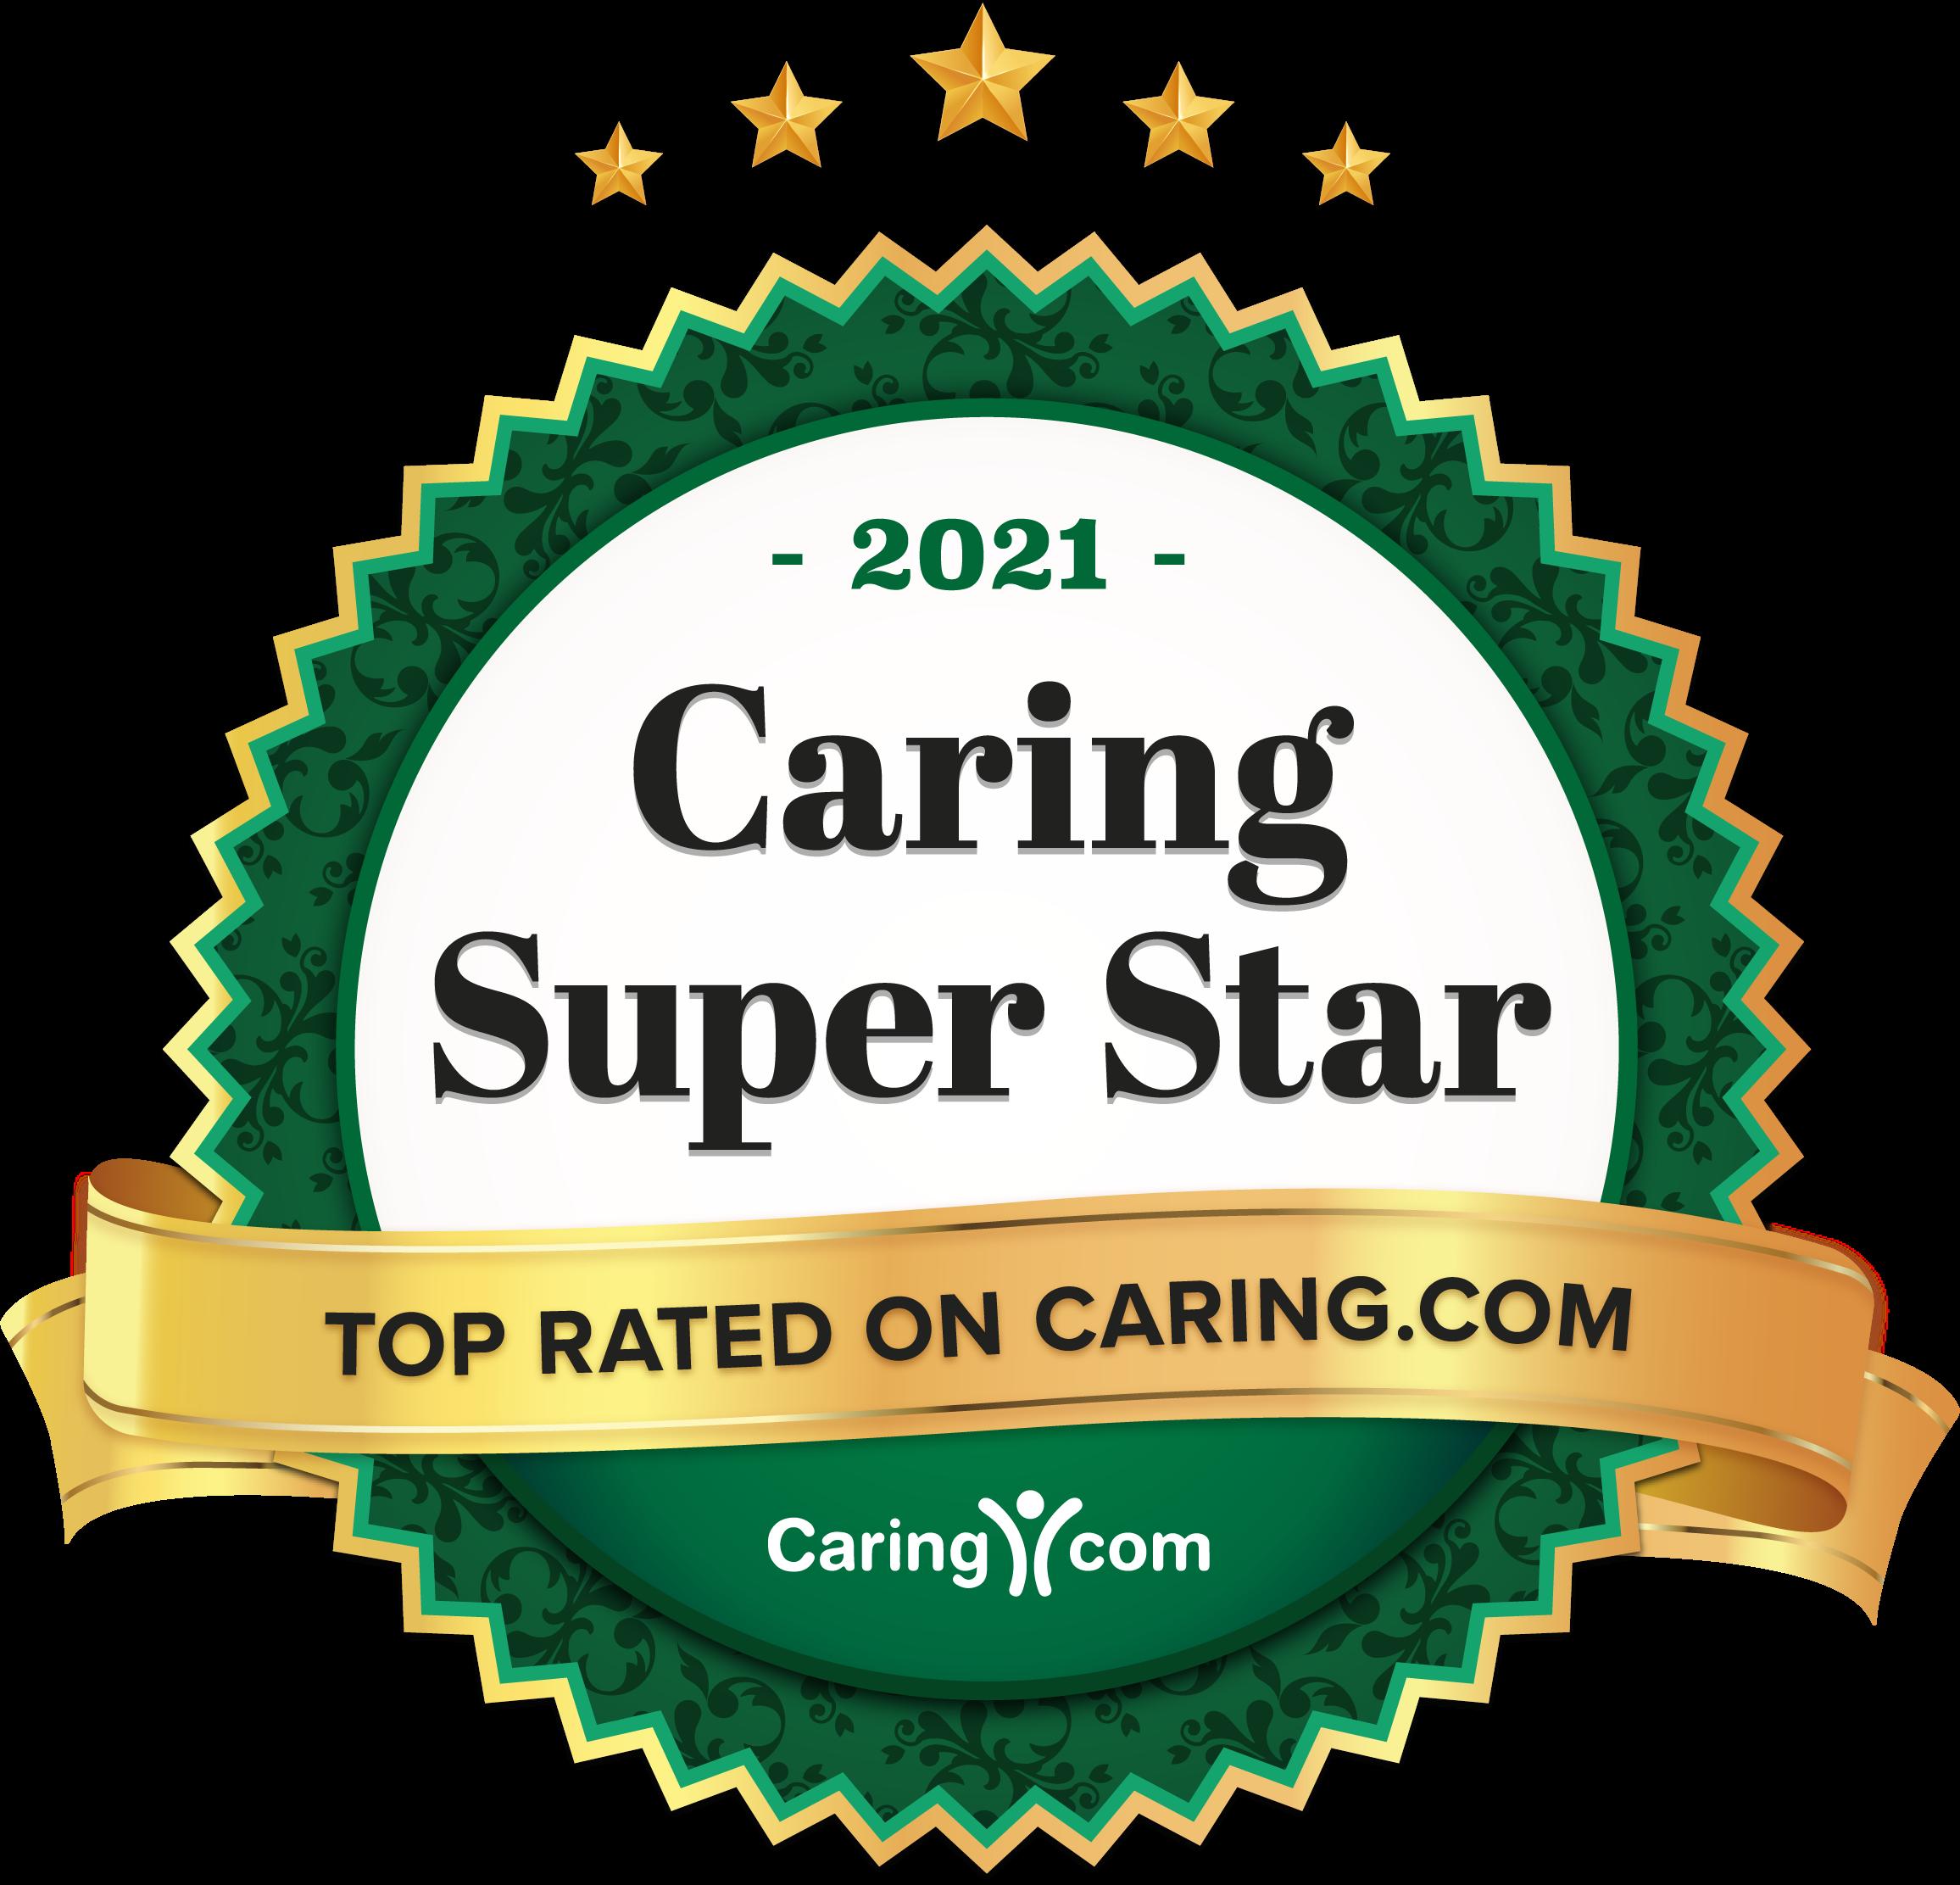 2021 caring super star